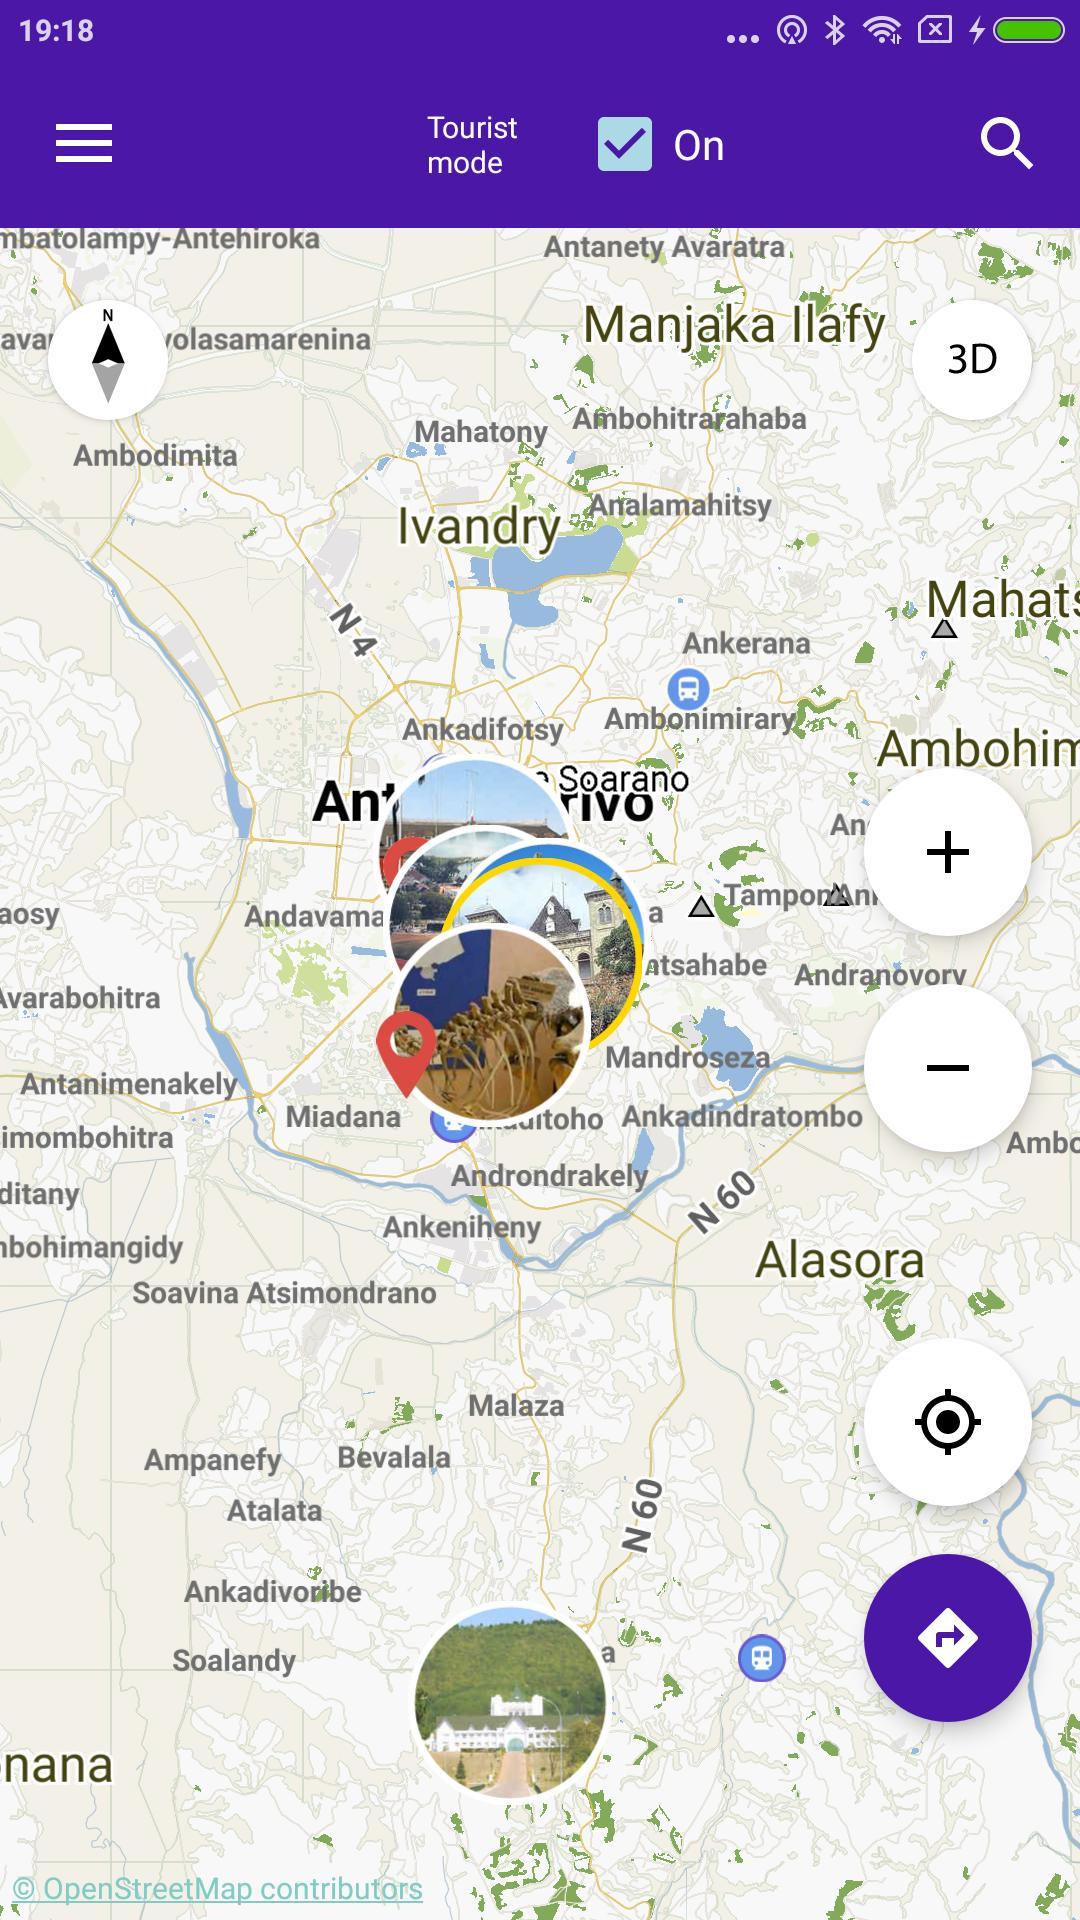 Antananarivo for Android - APK Download on sherbro island map, mbabane map, monrovia map, niamey map, cairo map, asmara map, kampala map, malabo map, masoala national park map, lilongwe map, pretoria map, casablanca map, harare map, kinshasa map, bujumbura map, maseru map, lagos map, dar es salaam map, johannesburg map, al hasakah map,